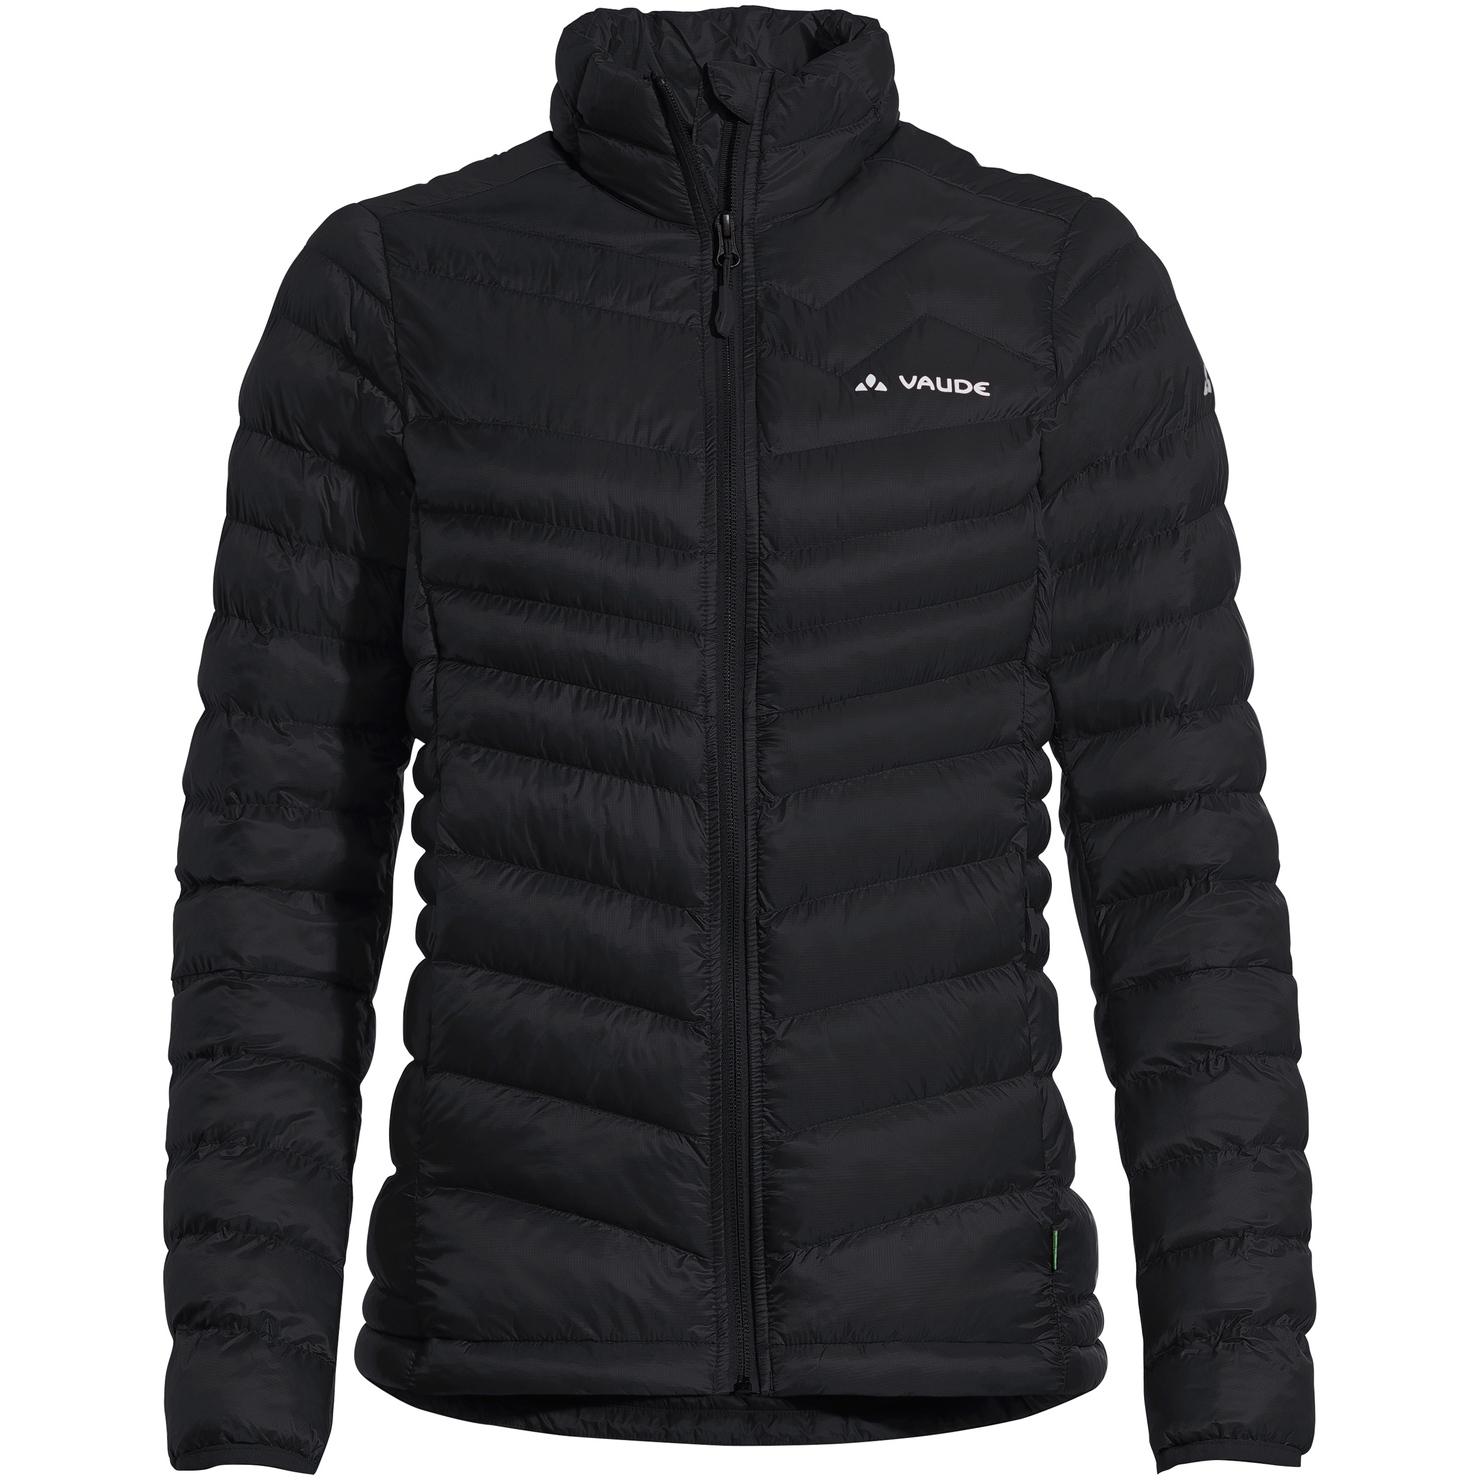 Image of Vaude Women's Batura Insulation Jacket - black